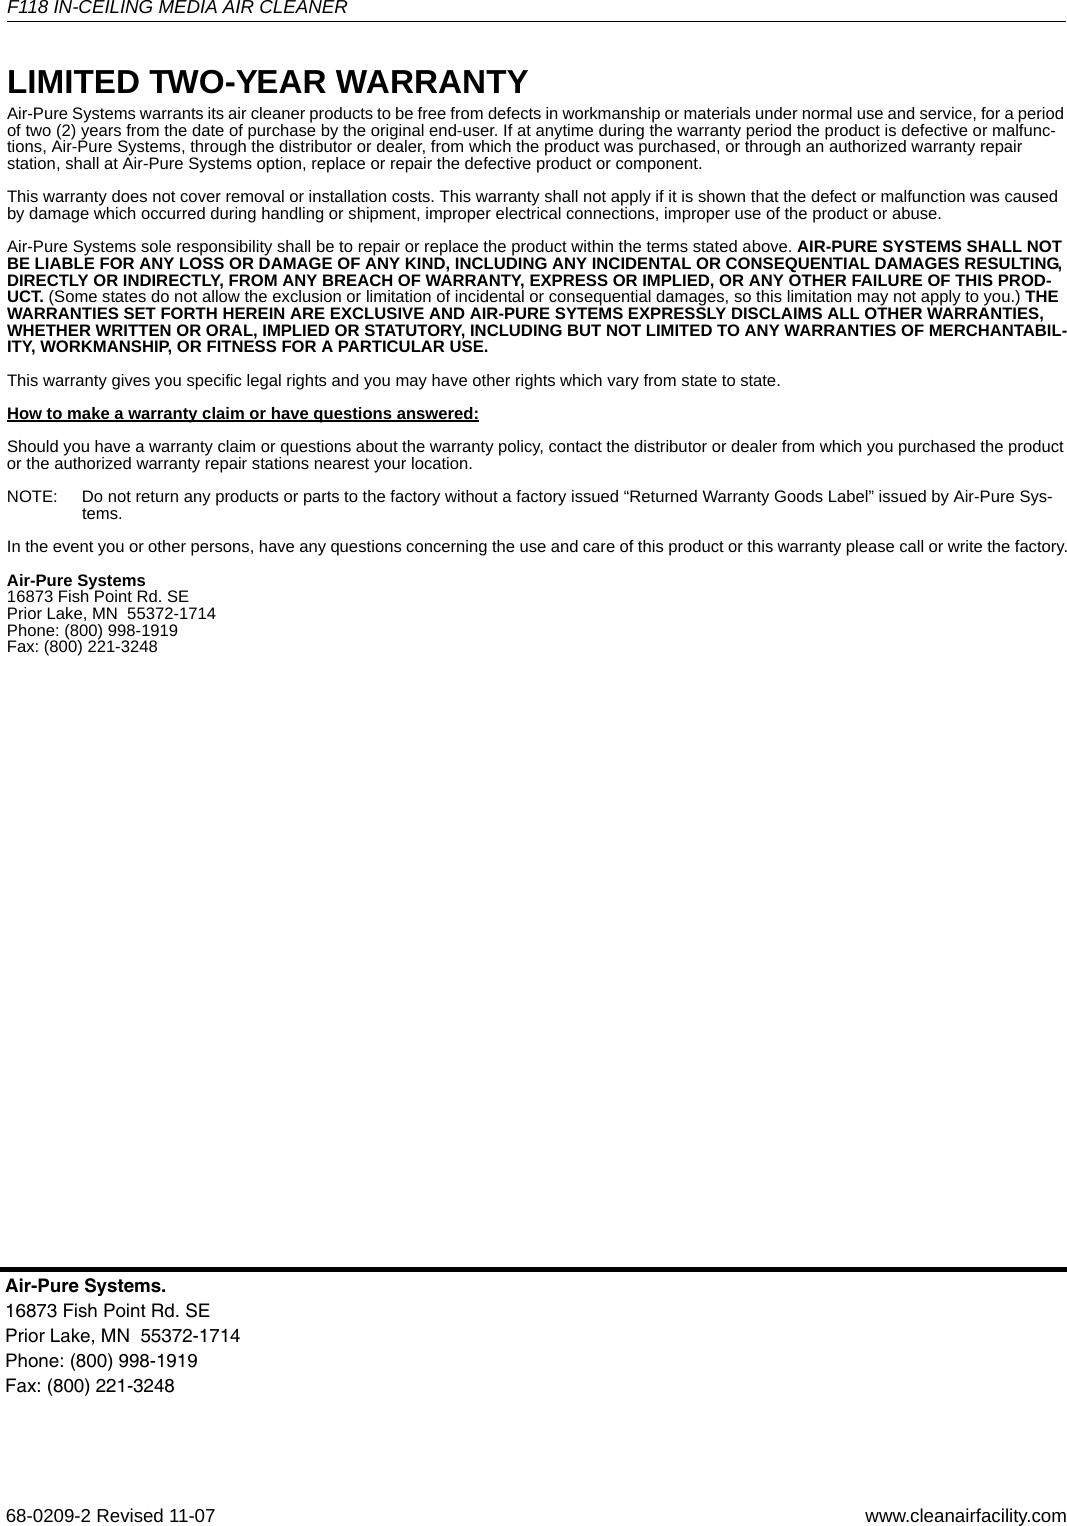 Honeywell F118 68 0209 2 Product Data User Manual To The 84eba213 ...